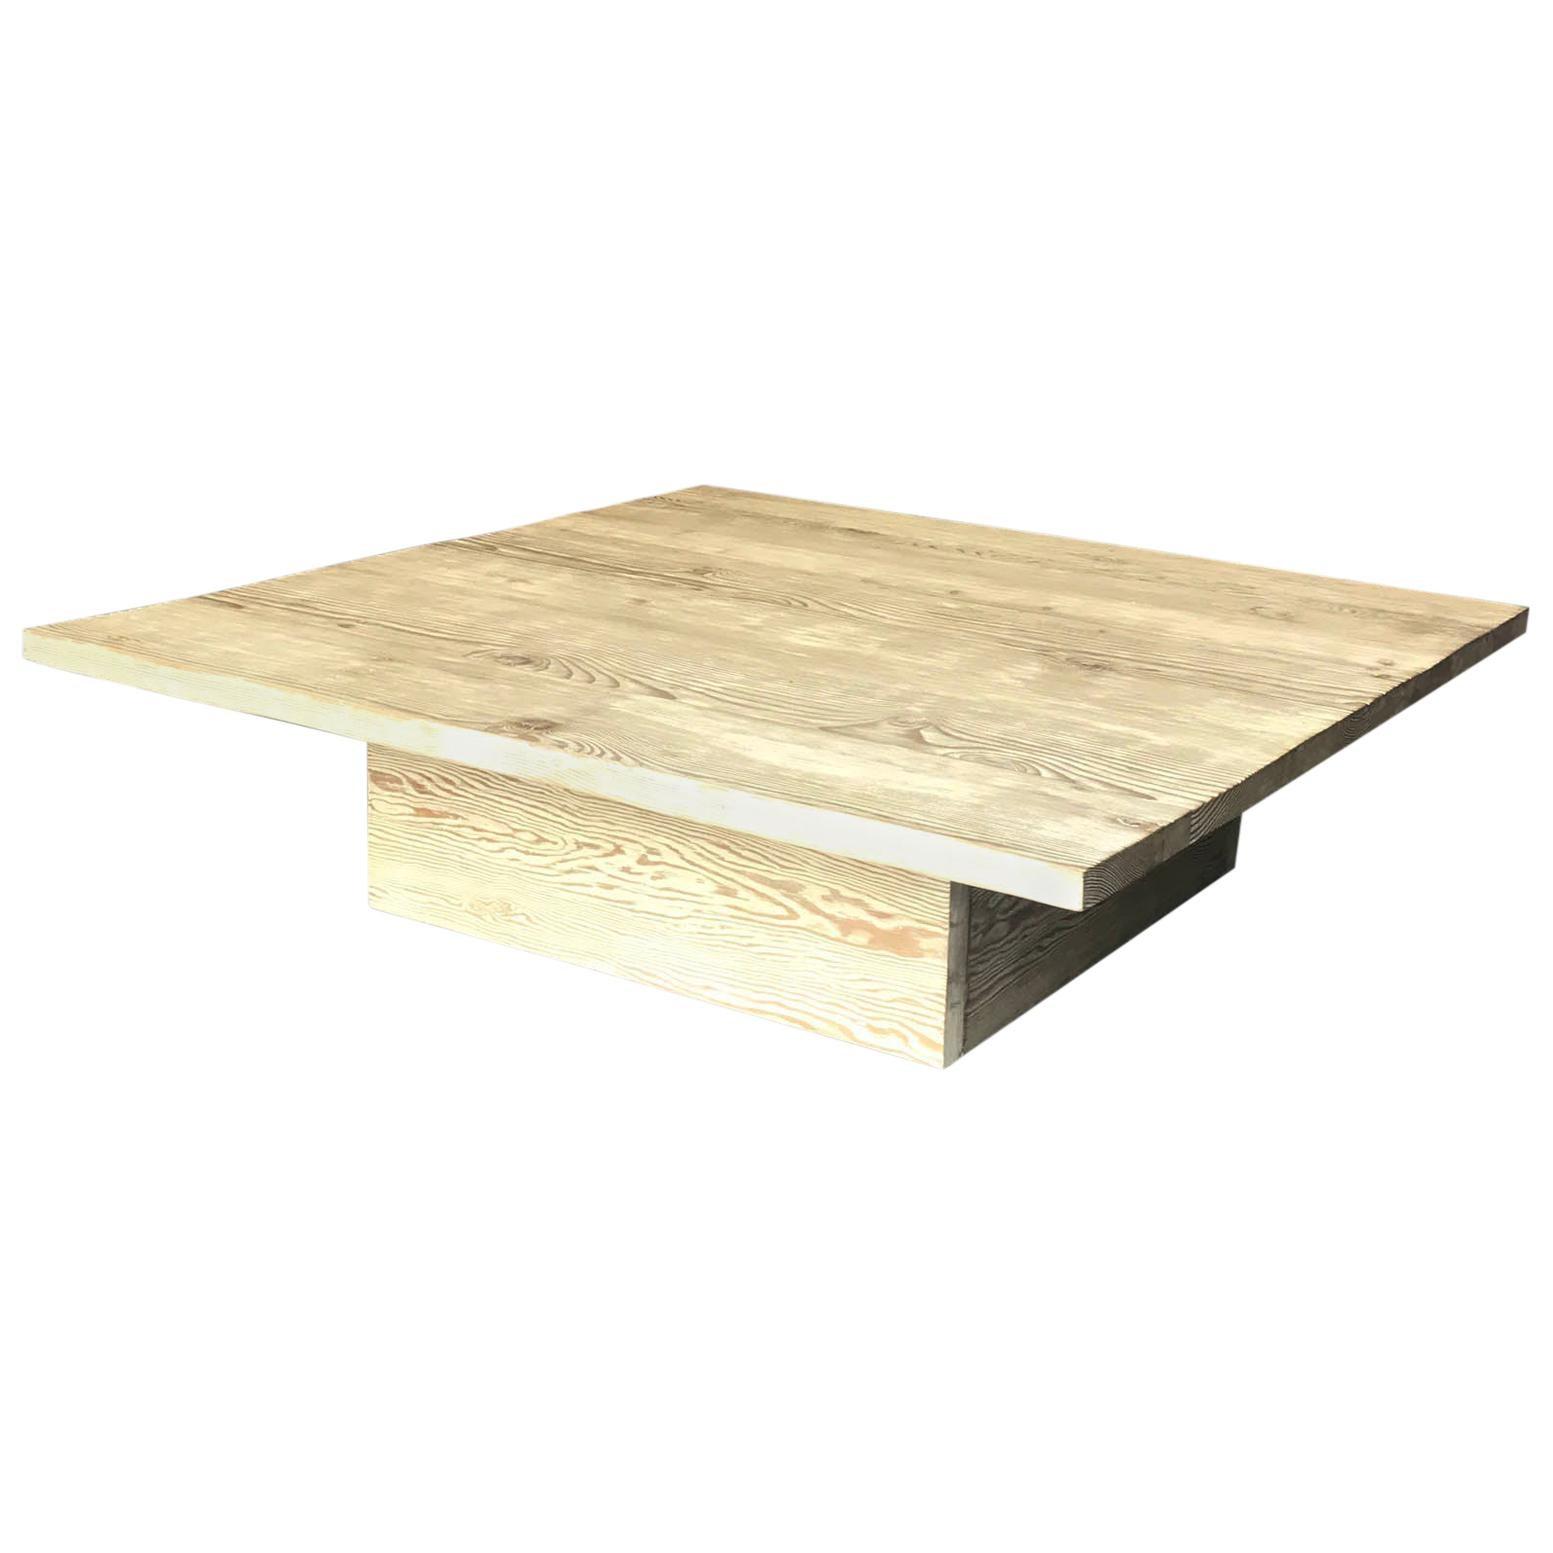 custom cerused reclaimed douglas fir wood coffee table